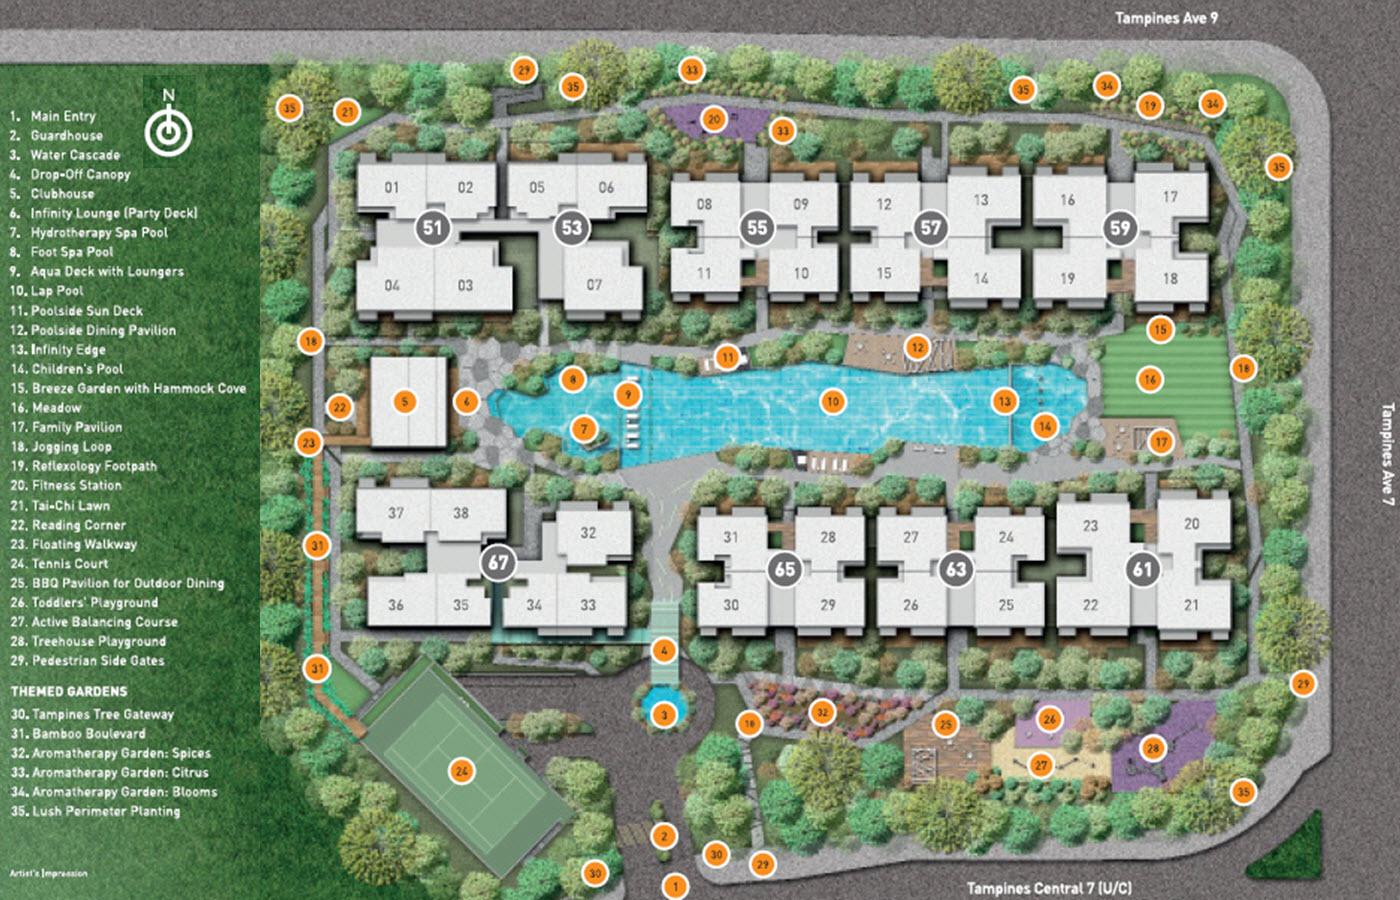 Citylife At Tampines EC Site Plan & Facilities